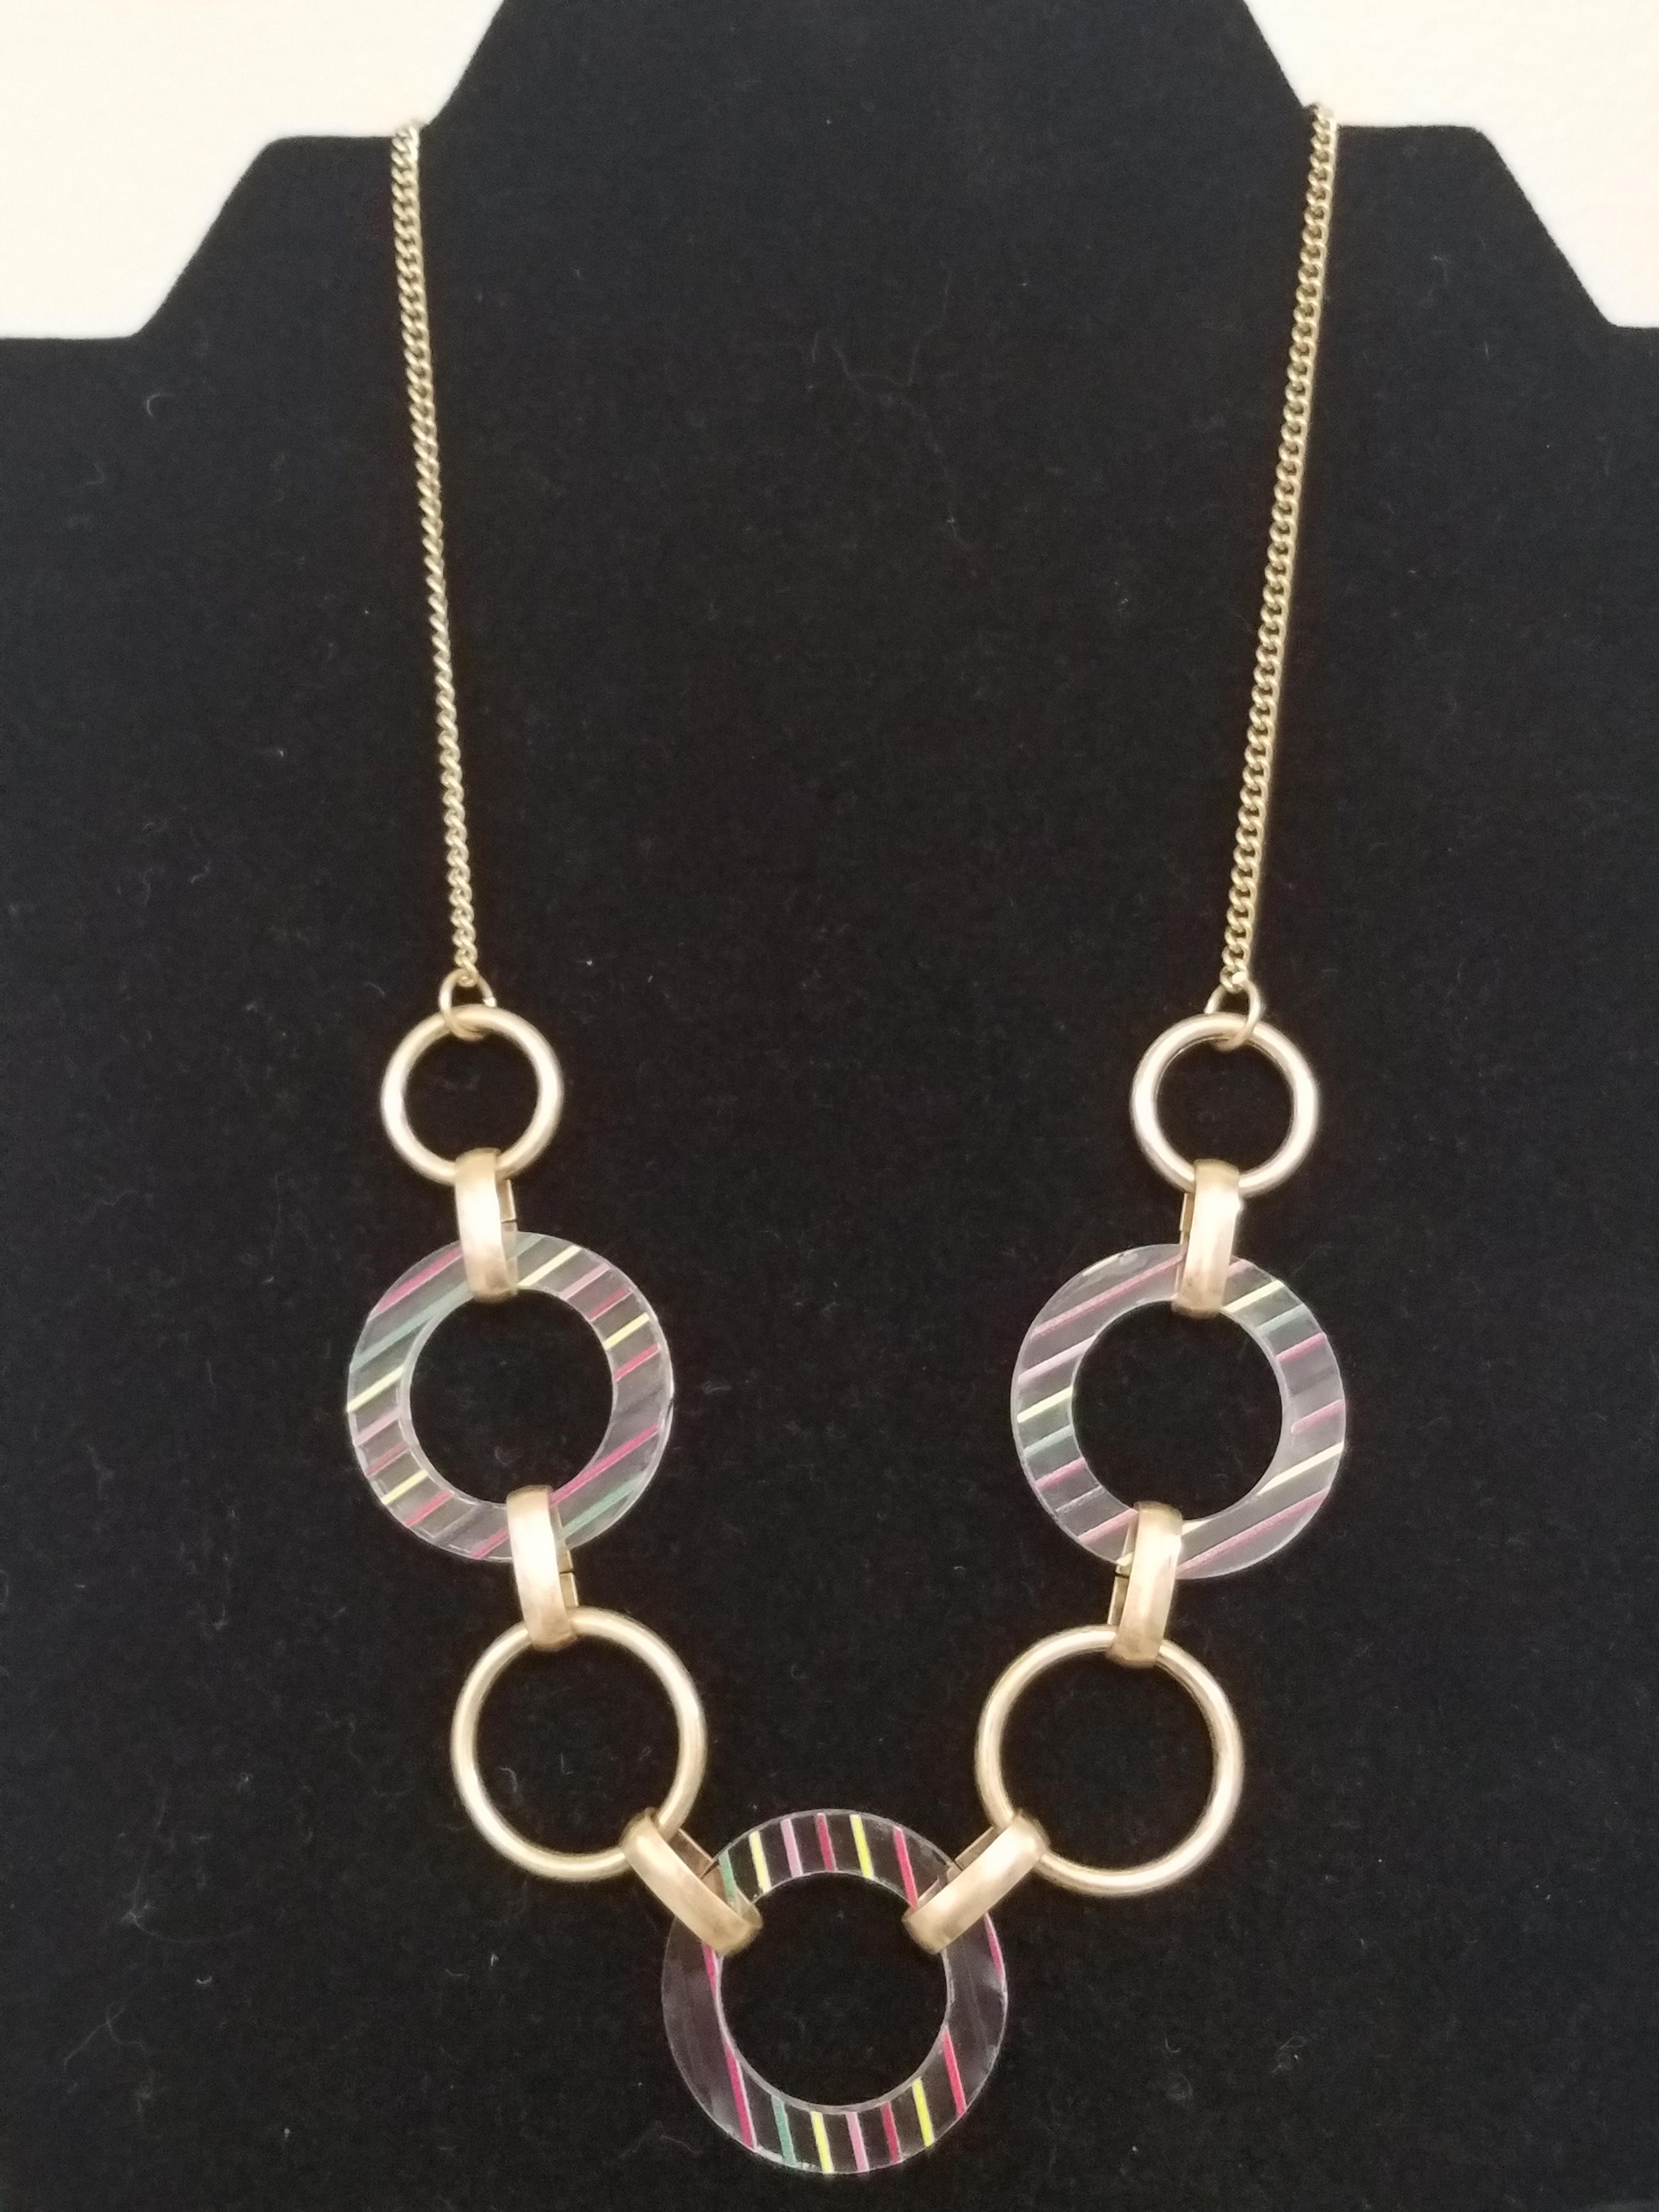 80's Retro Necklace